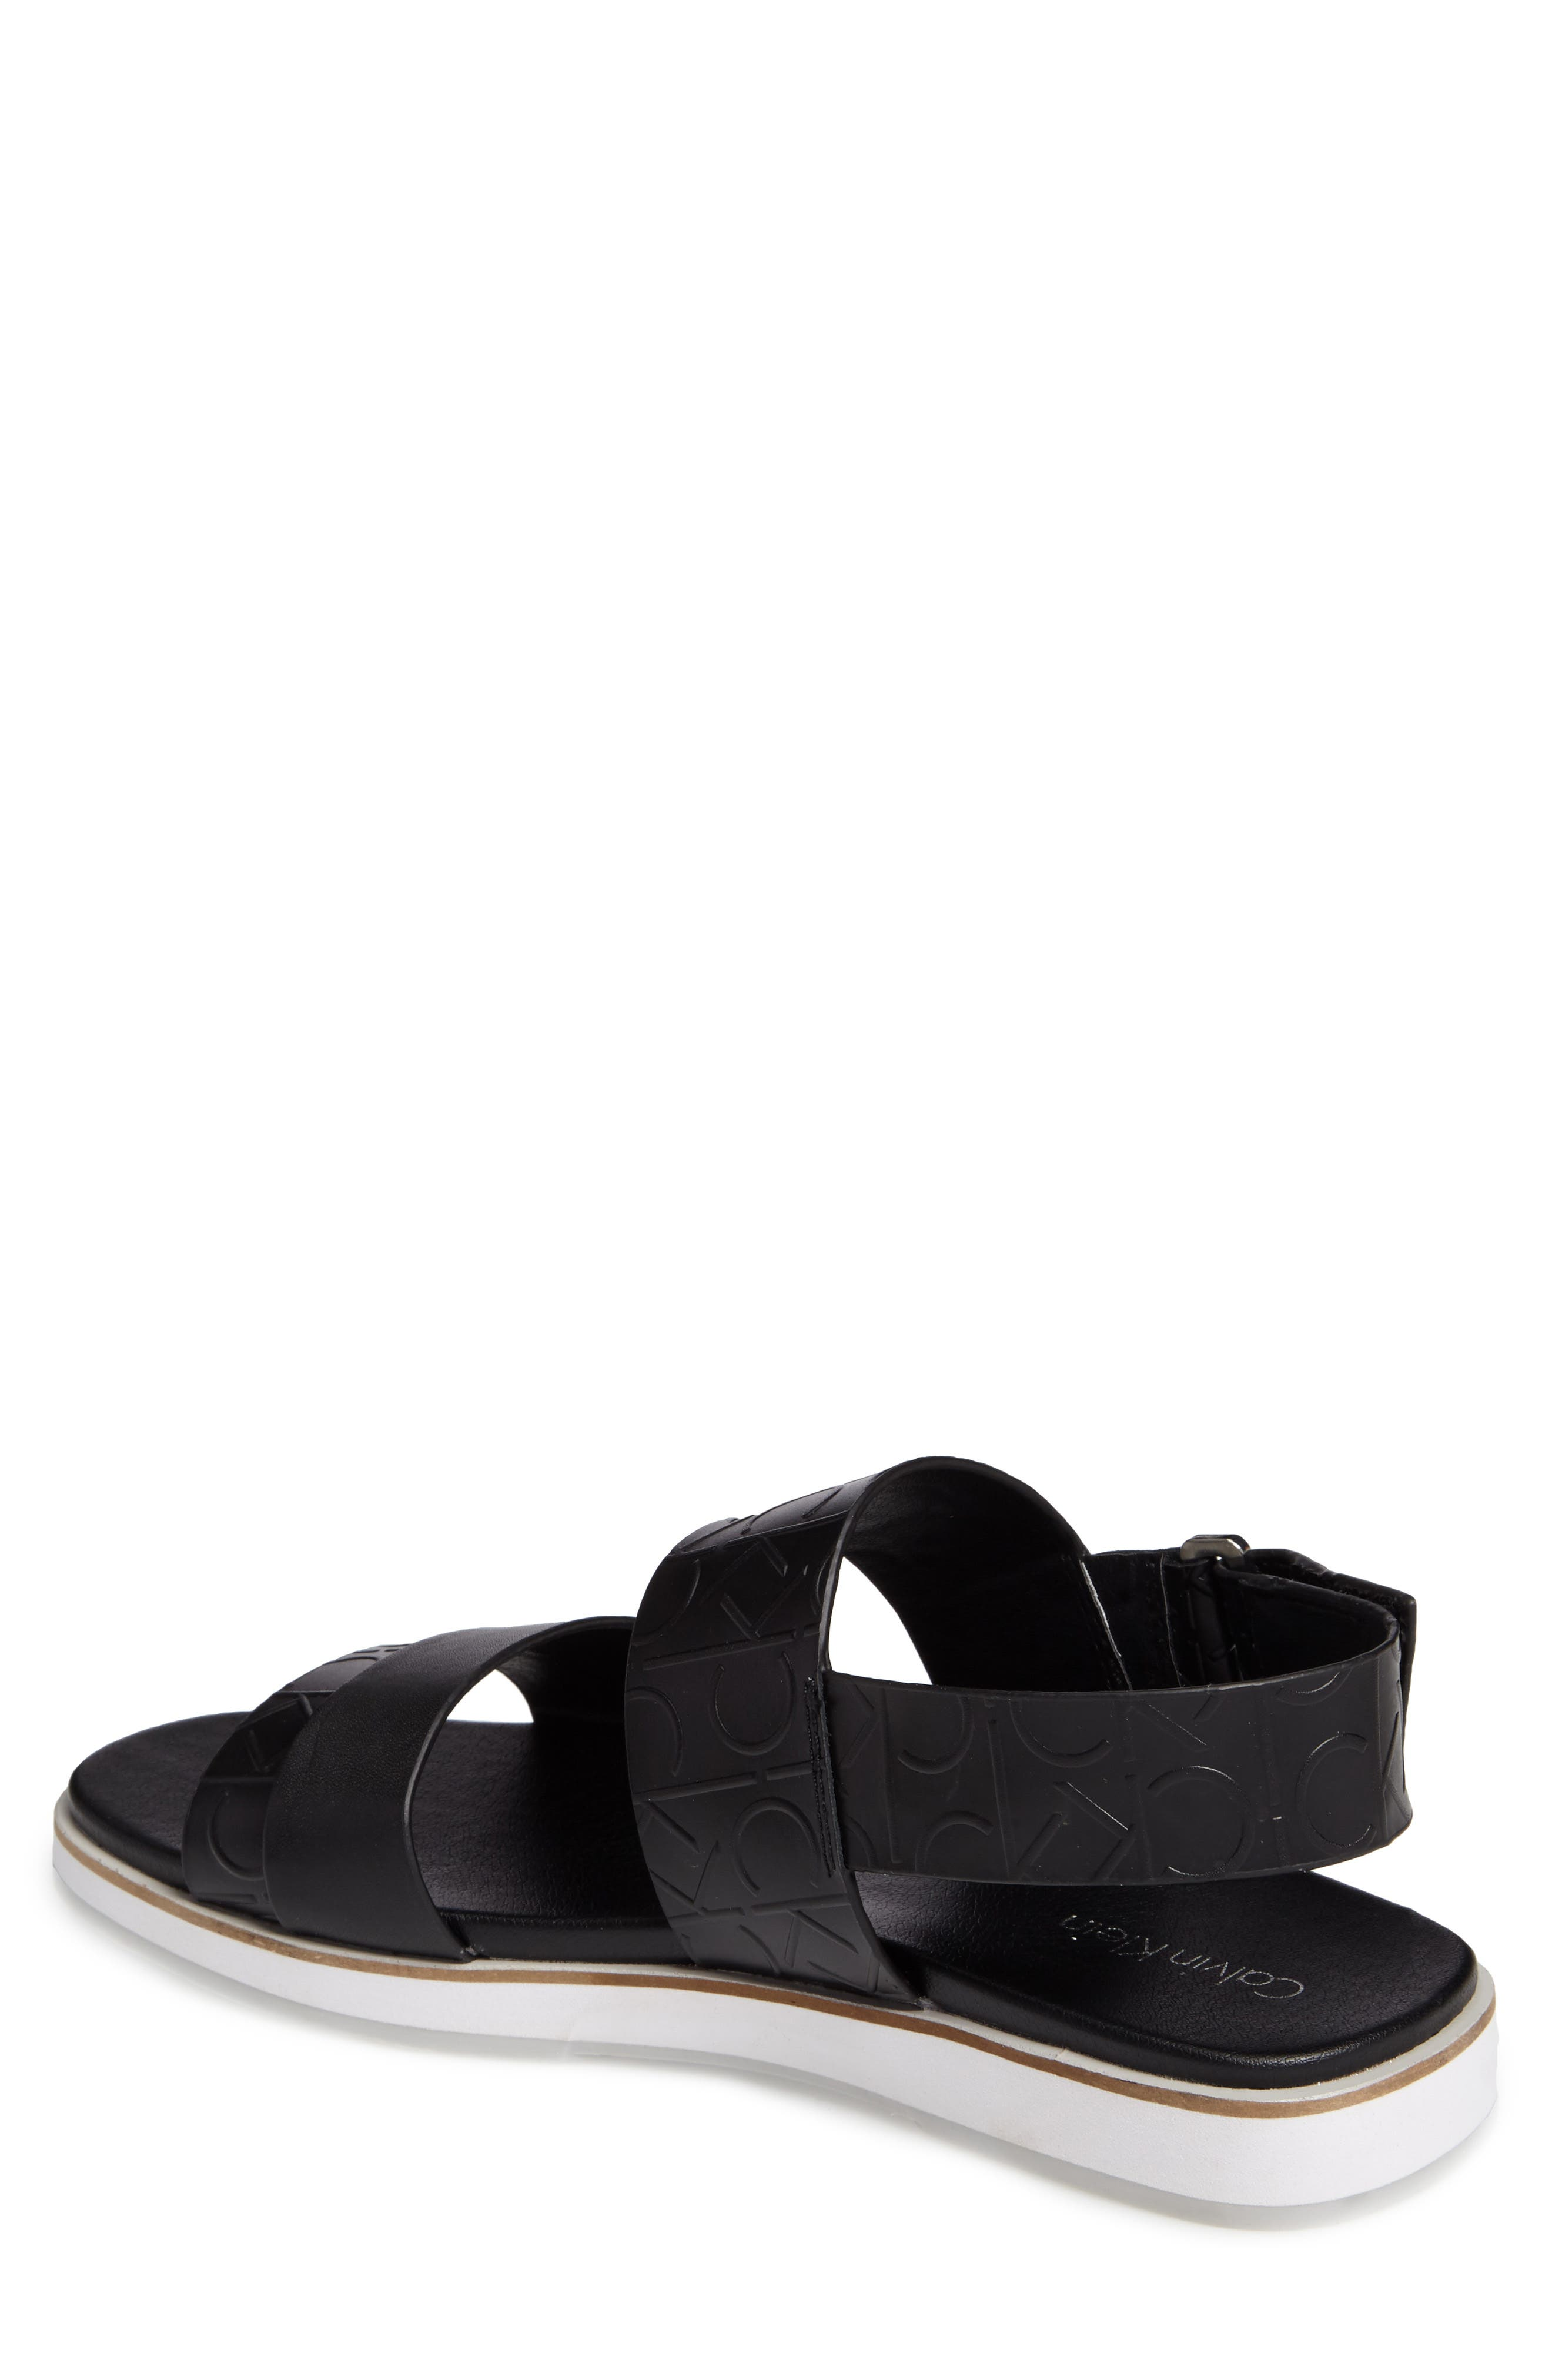 'Dex' Embossed Leather Sandal,                             Alternate thumbnail 2, color,                             Black/Black